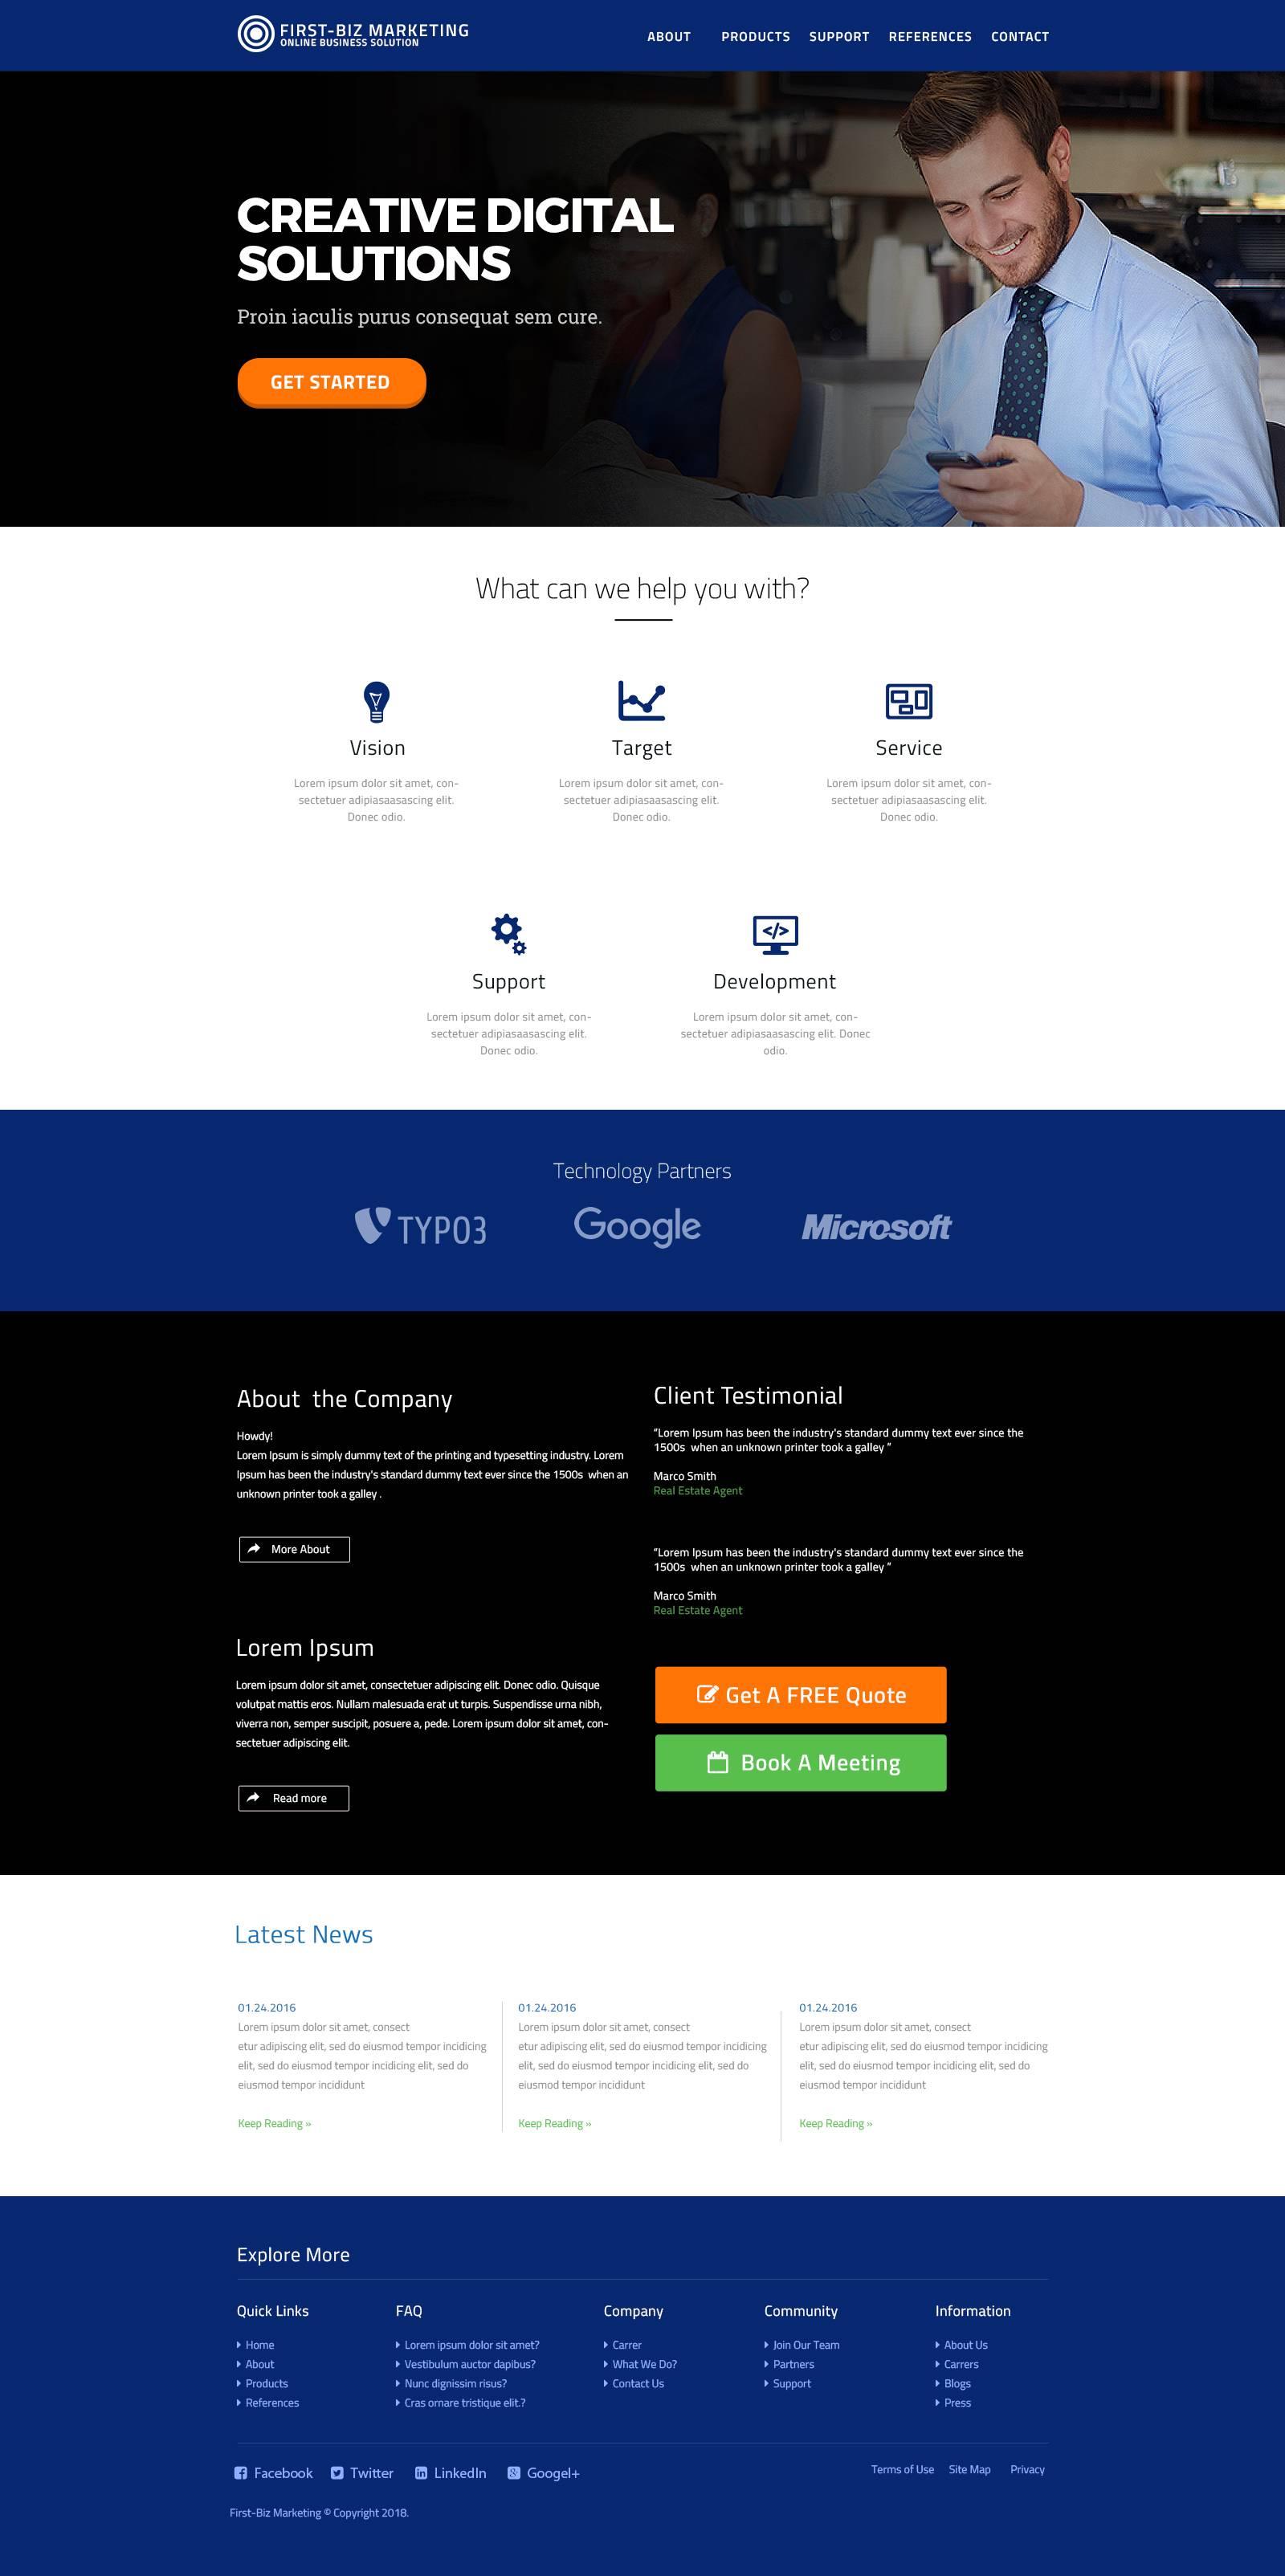 First Biz Marketing Page 网页模板 .psd素材下载 网页模板-第1张